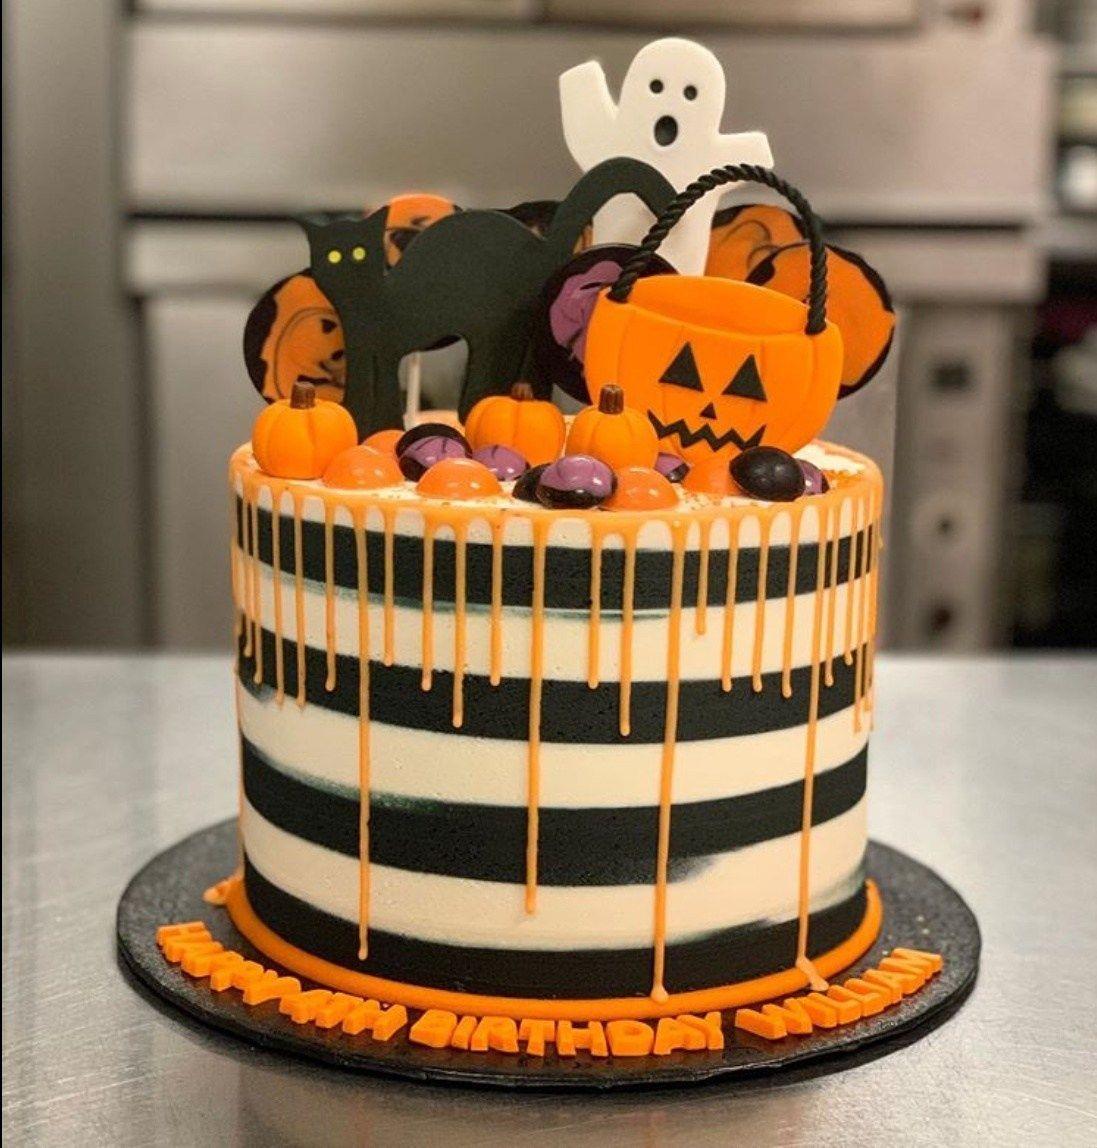 Halloween Cake Ideas 2020 50+ Spooktacular Halloween Cake Ideas   The Wonder Cottage in 2020